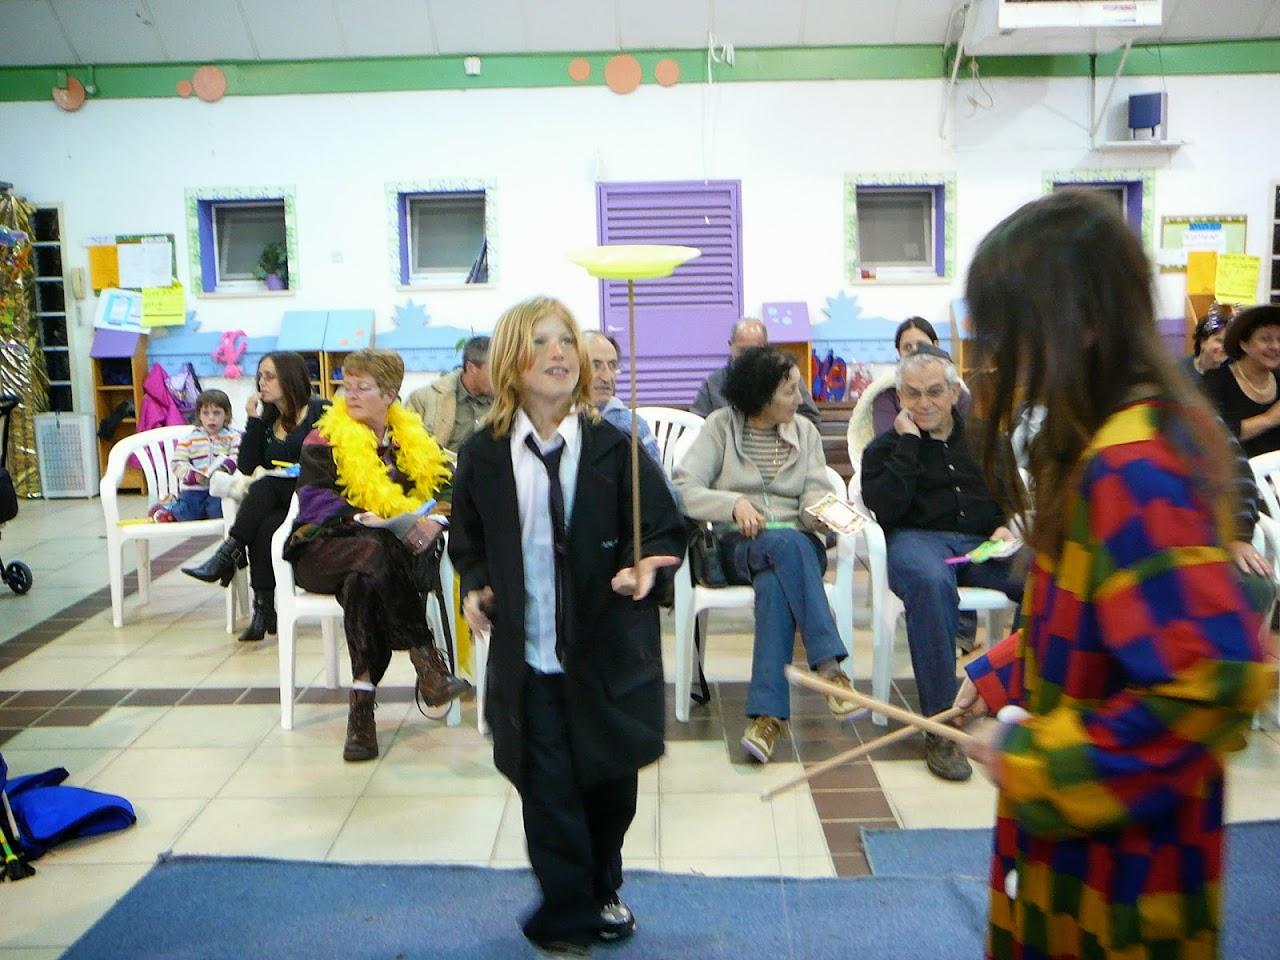 Purim 2007  - 2007-03-03 12.40.02.jpg